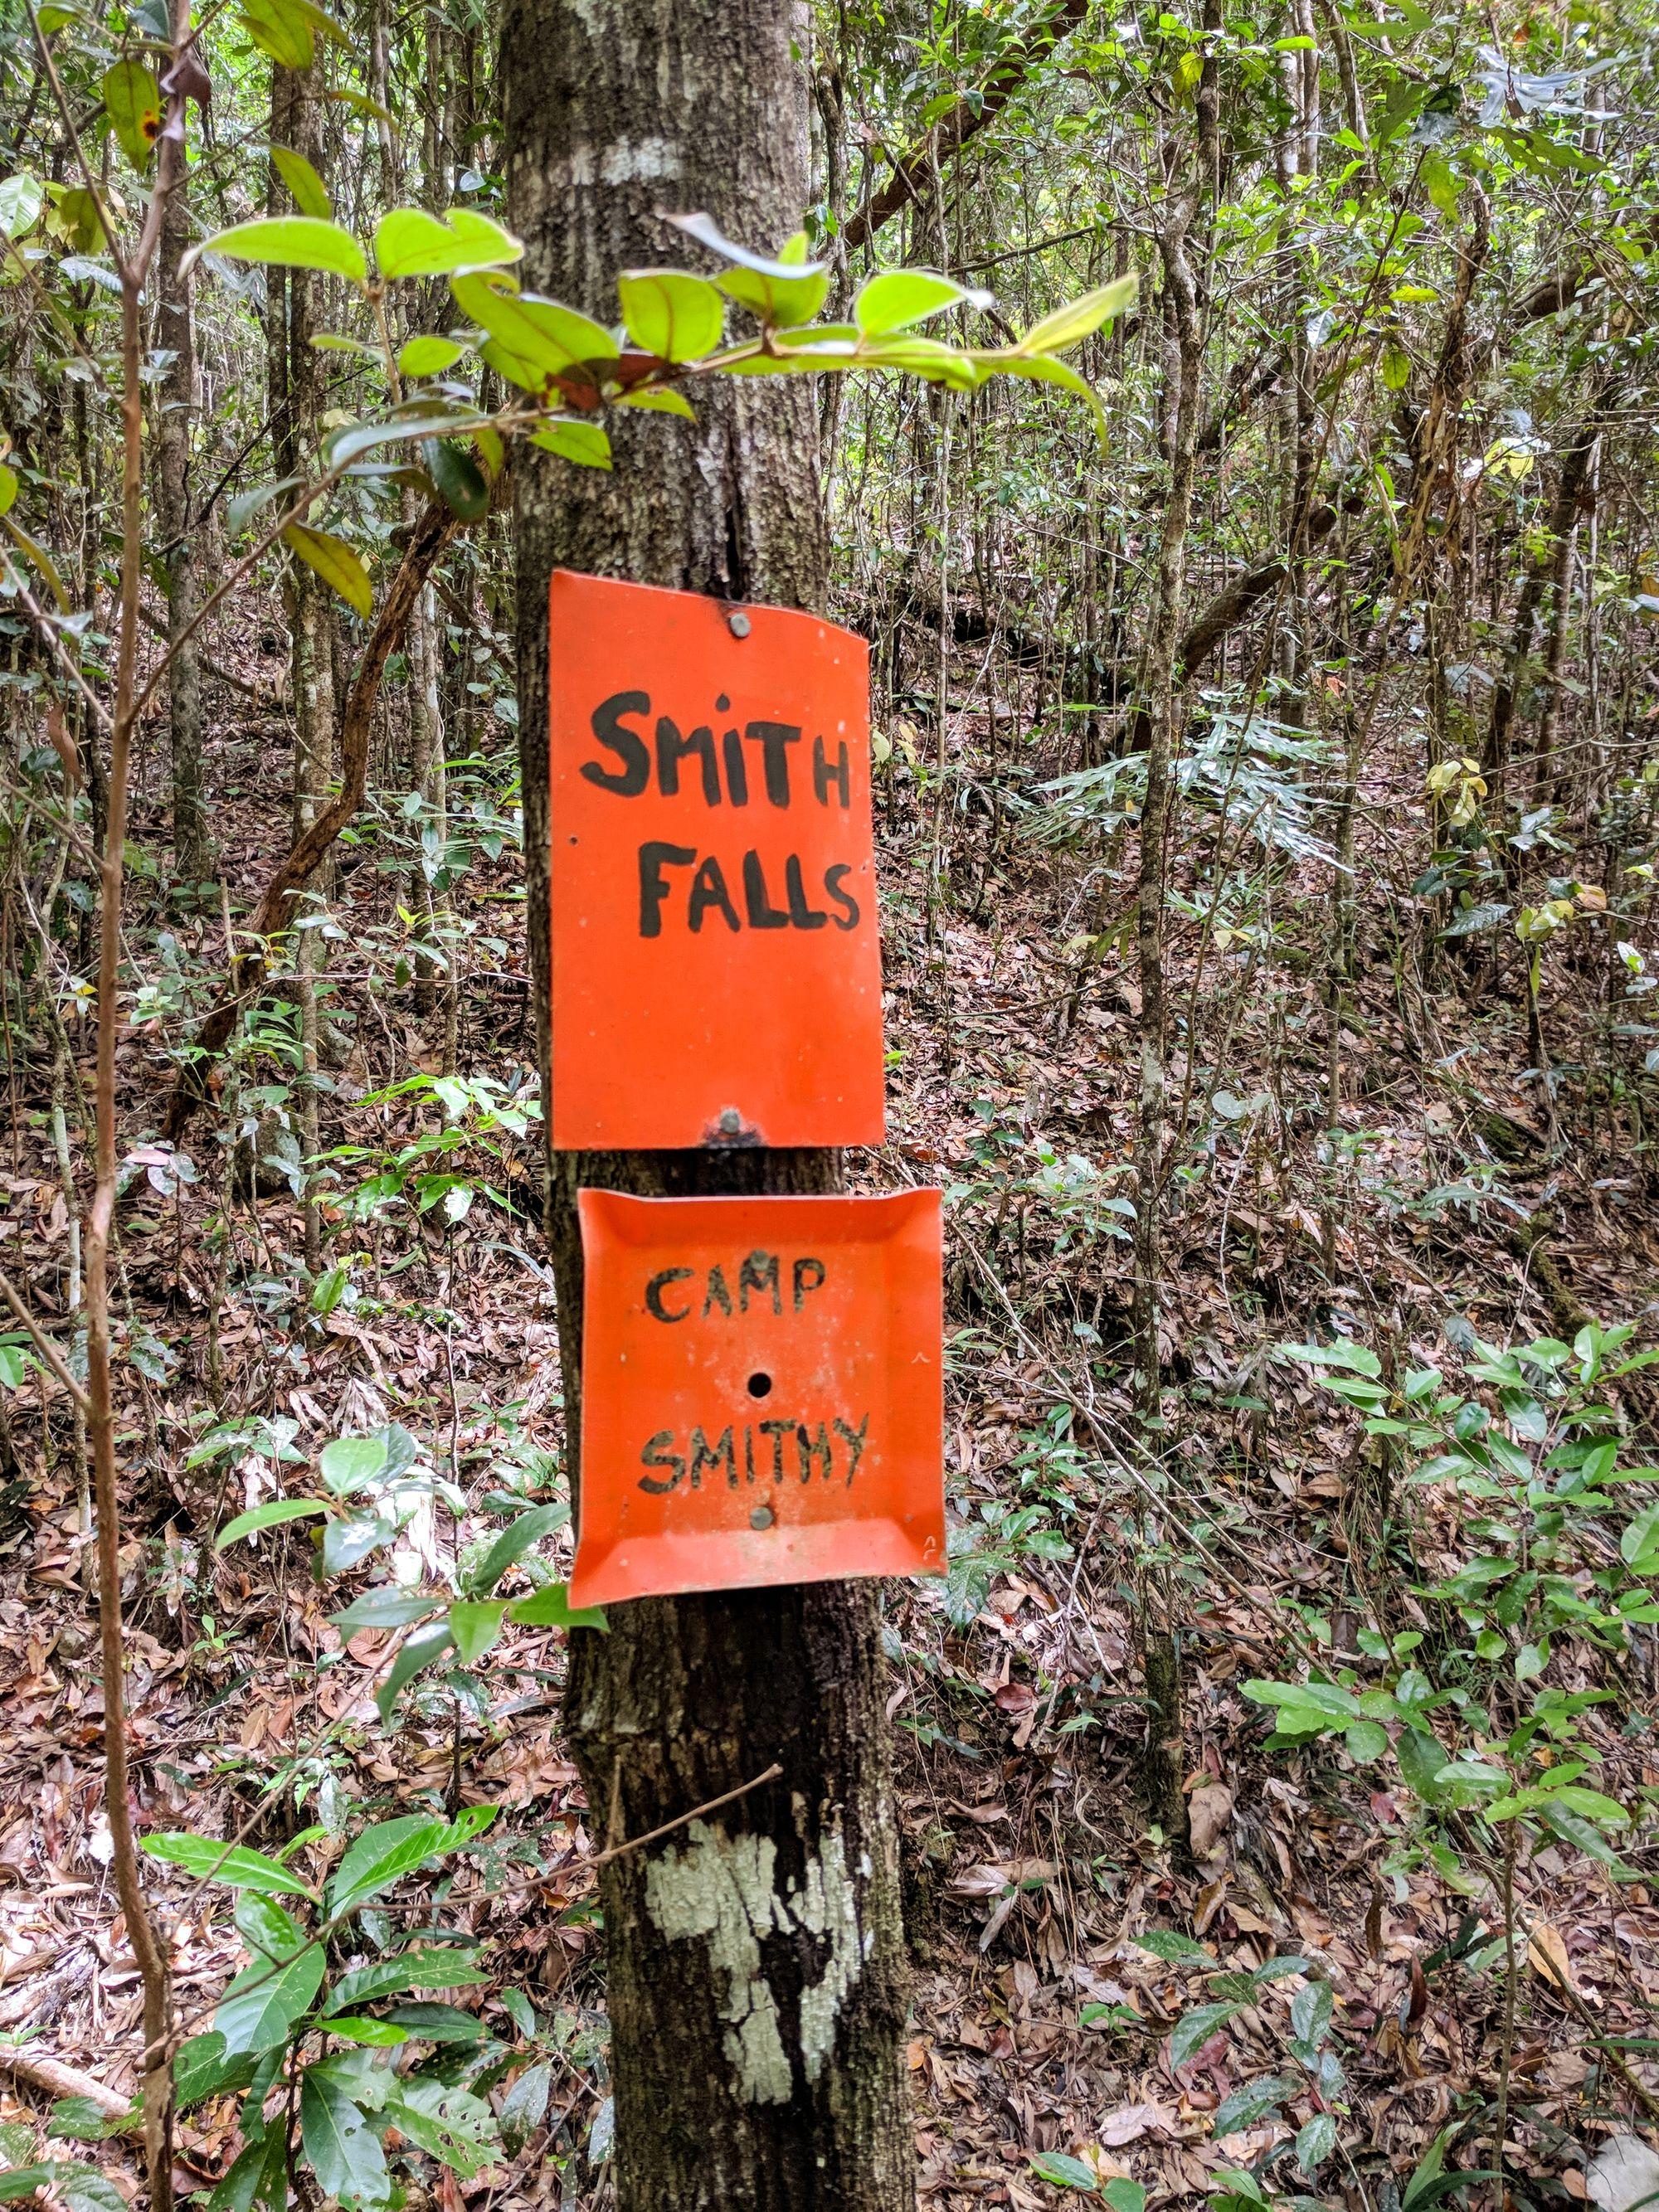 smith falls camp smithy sign